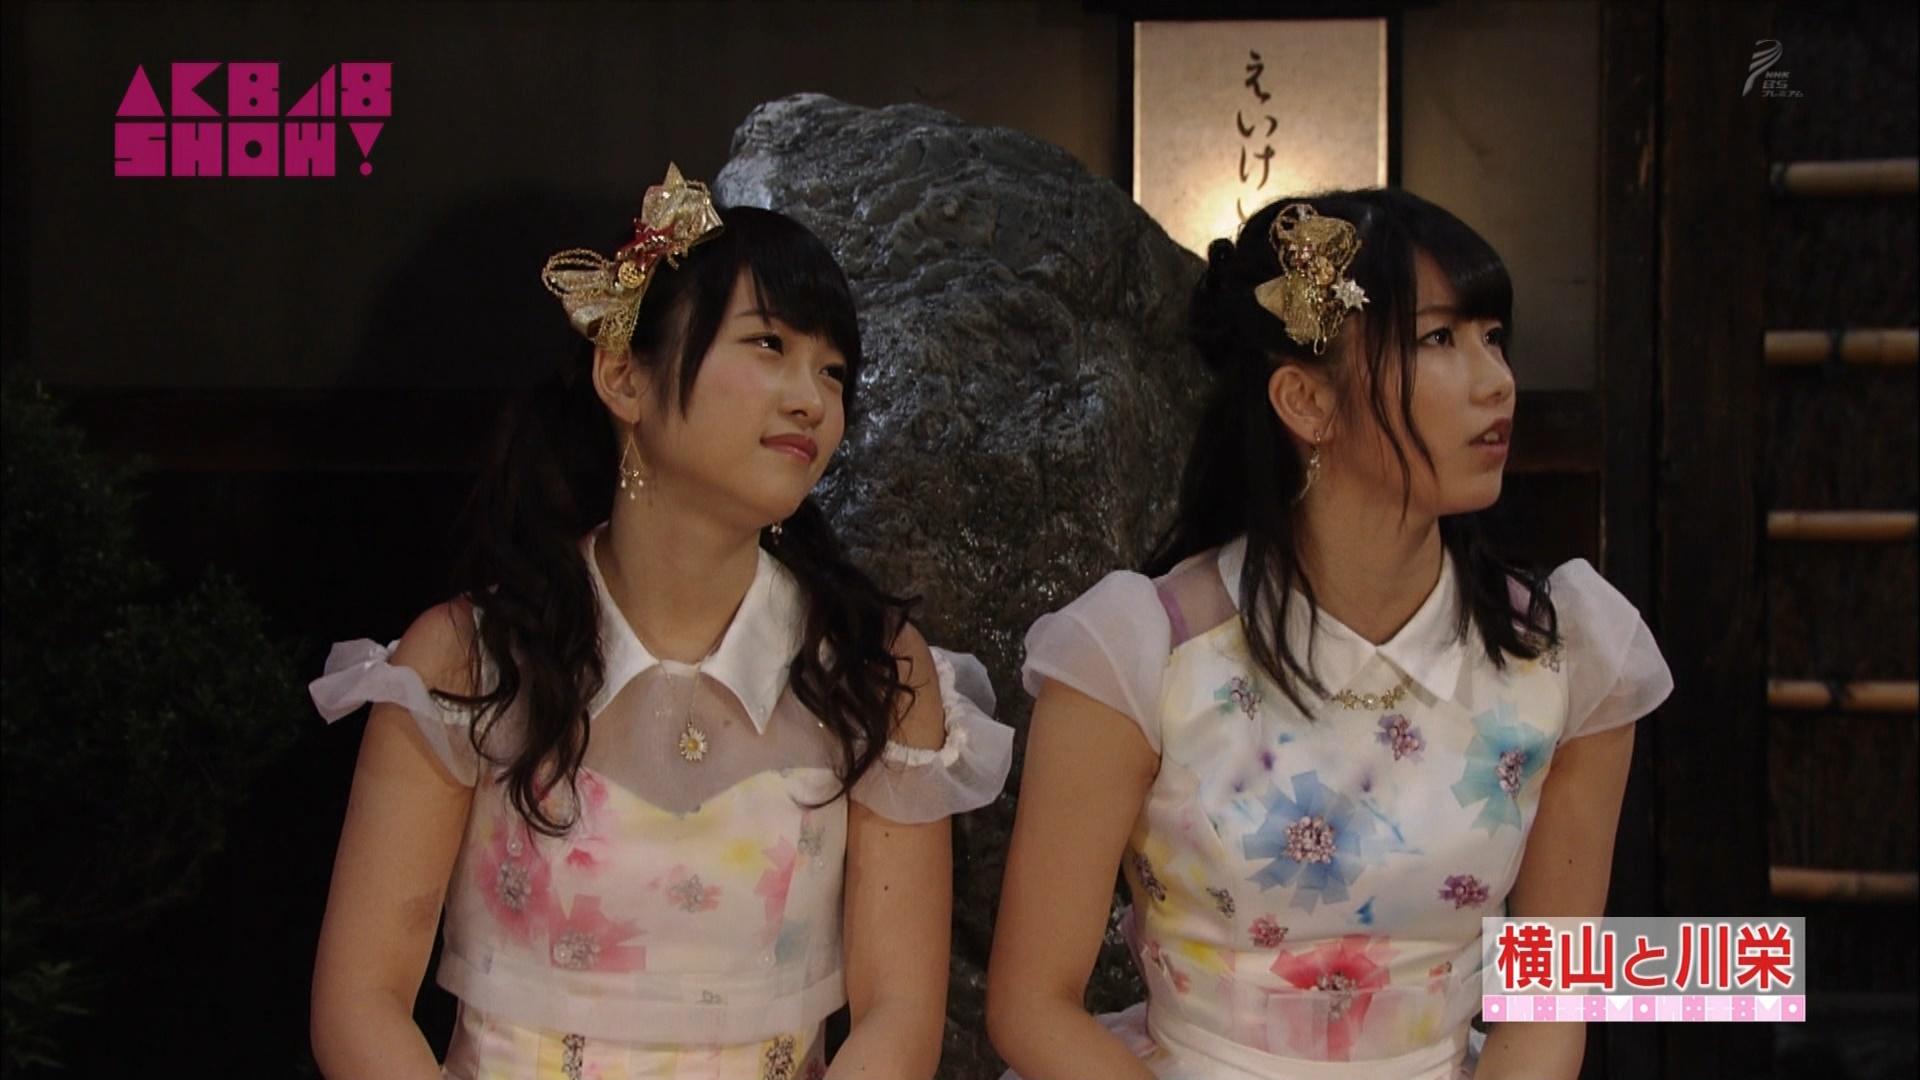 横山由依と川栄李奈 AKB48SHOW! 20140906 (31)